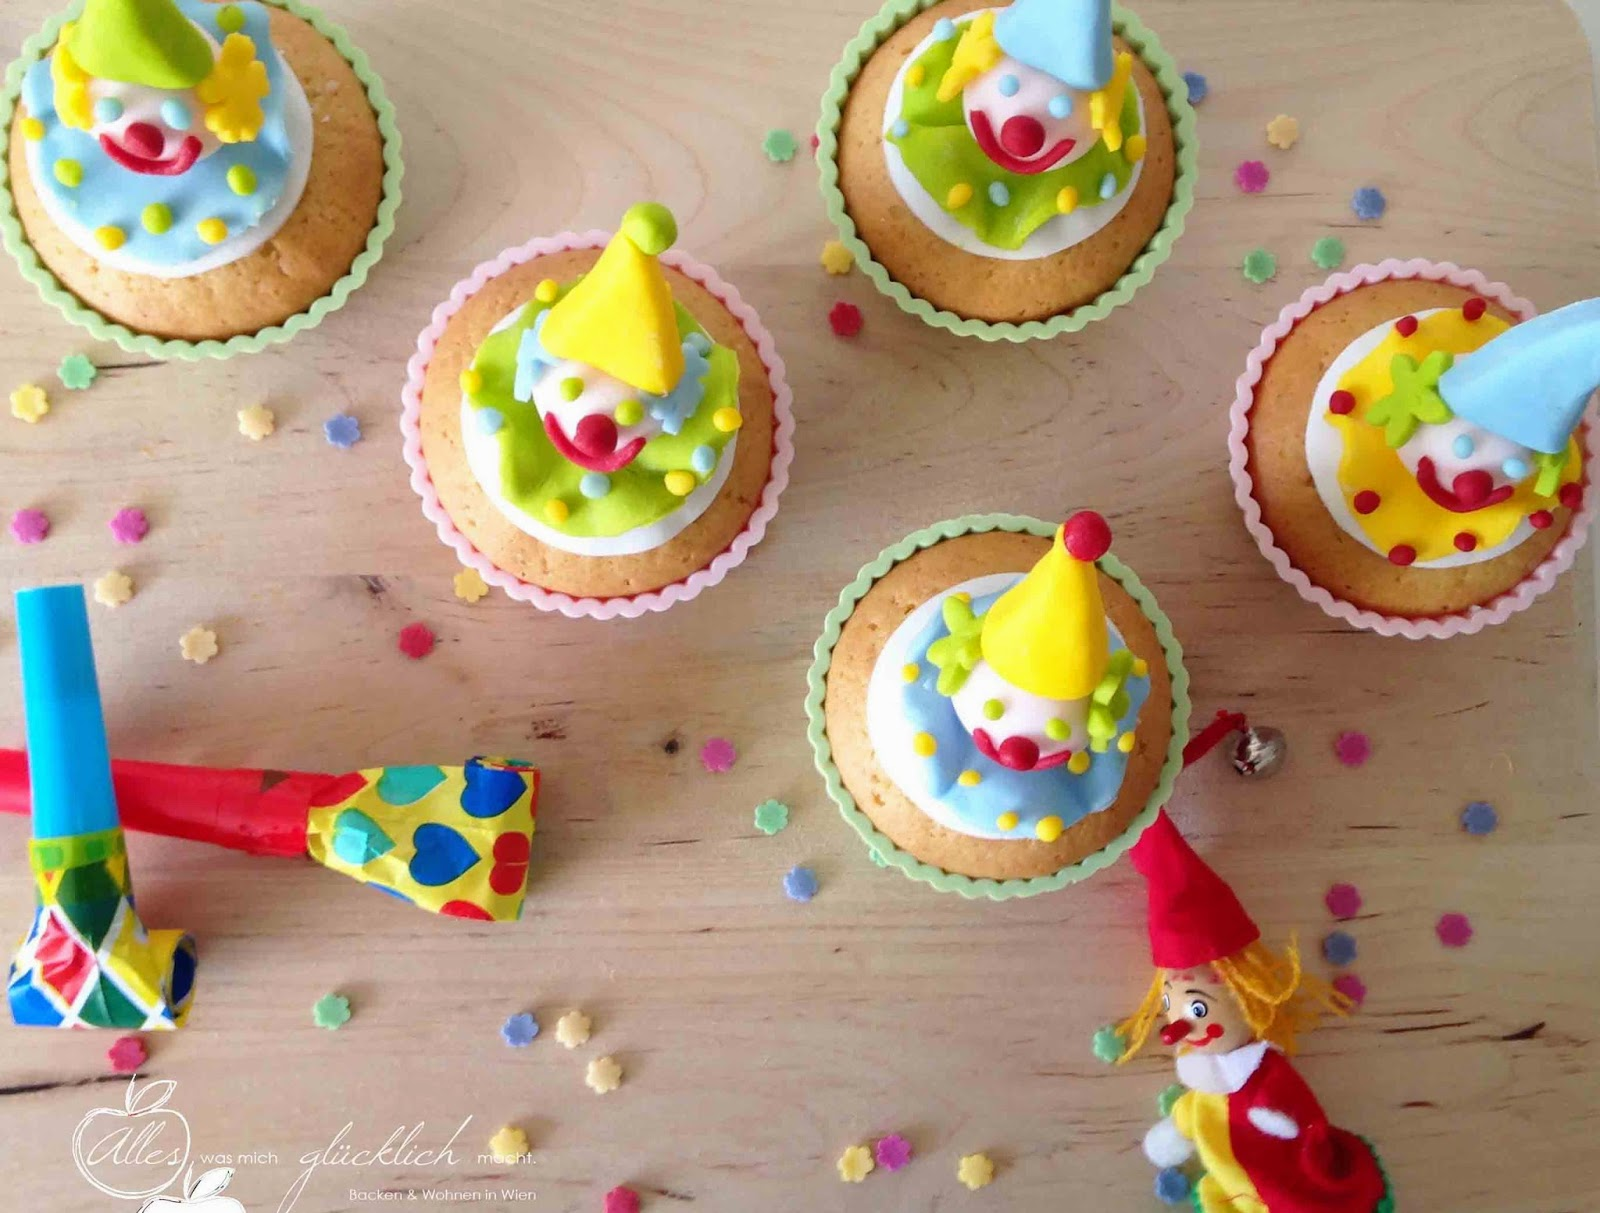 Lustig-fruchtige Clown Cupcakes (mit Maracuja Füllung)